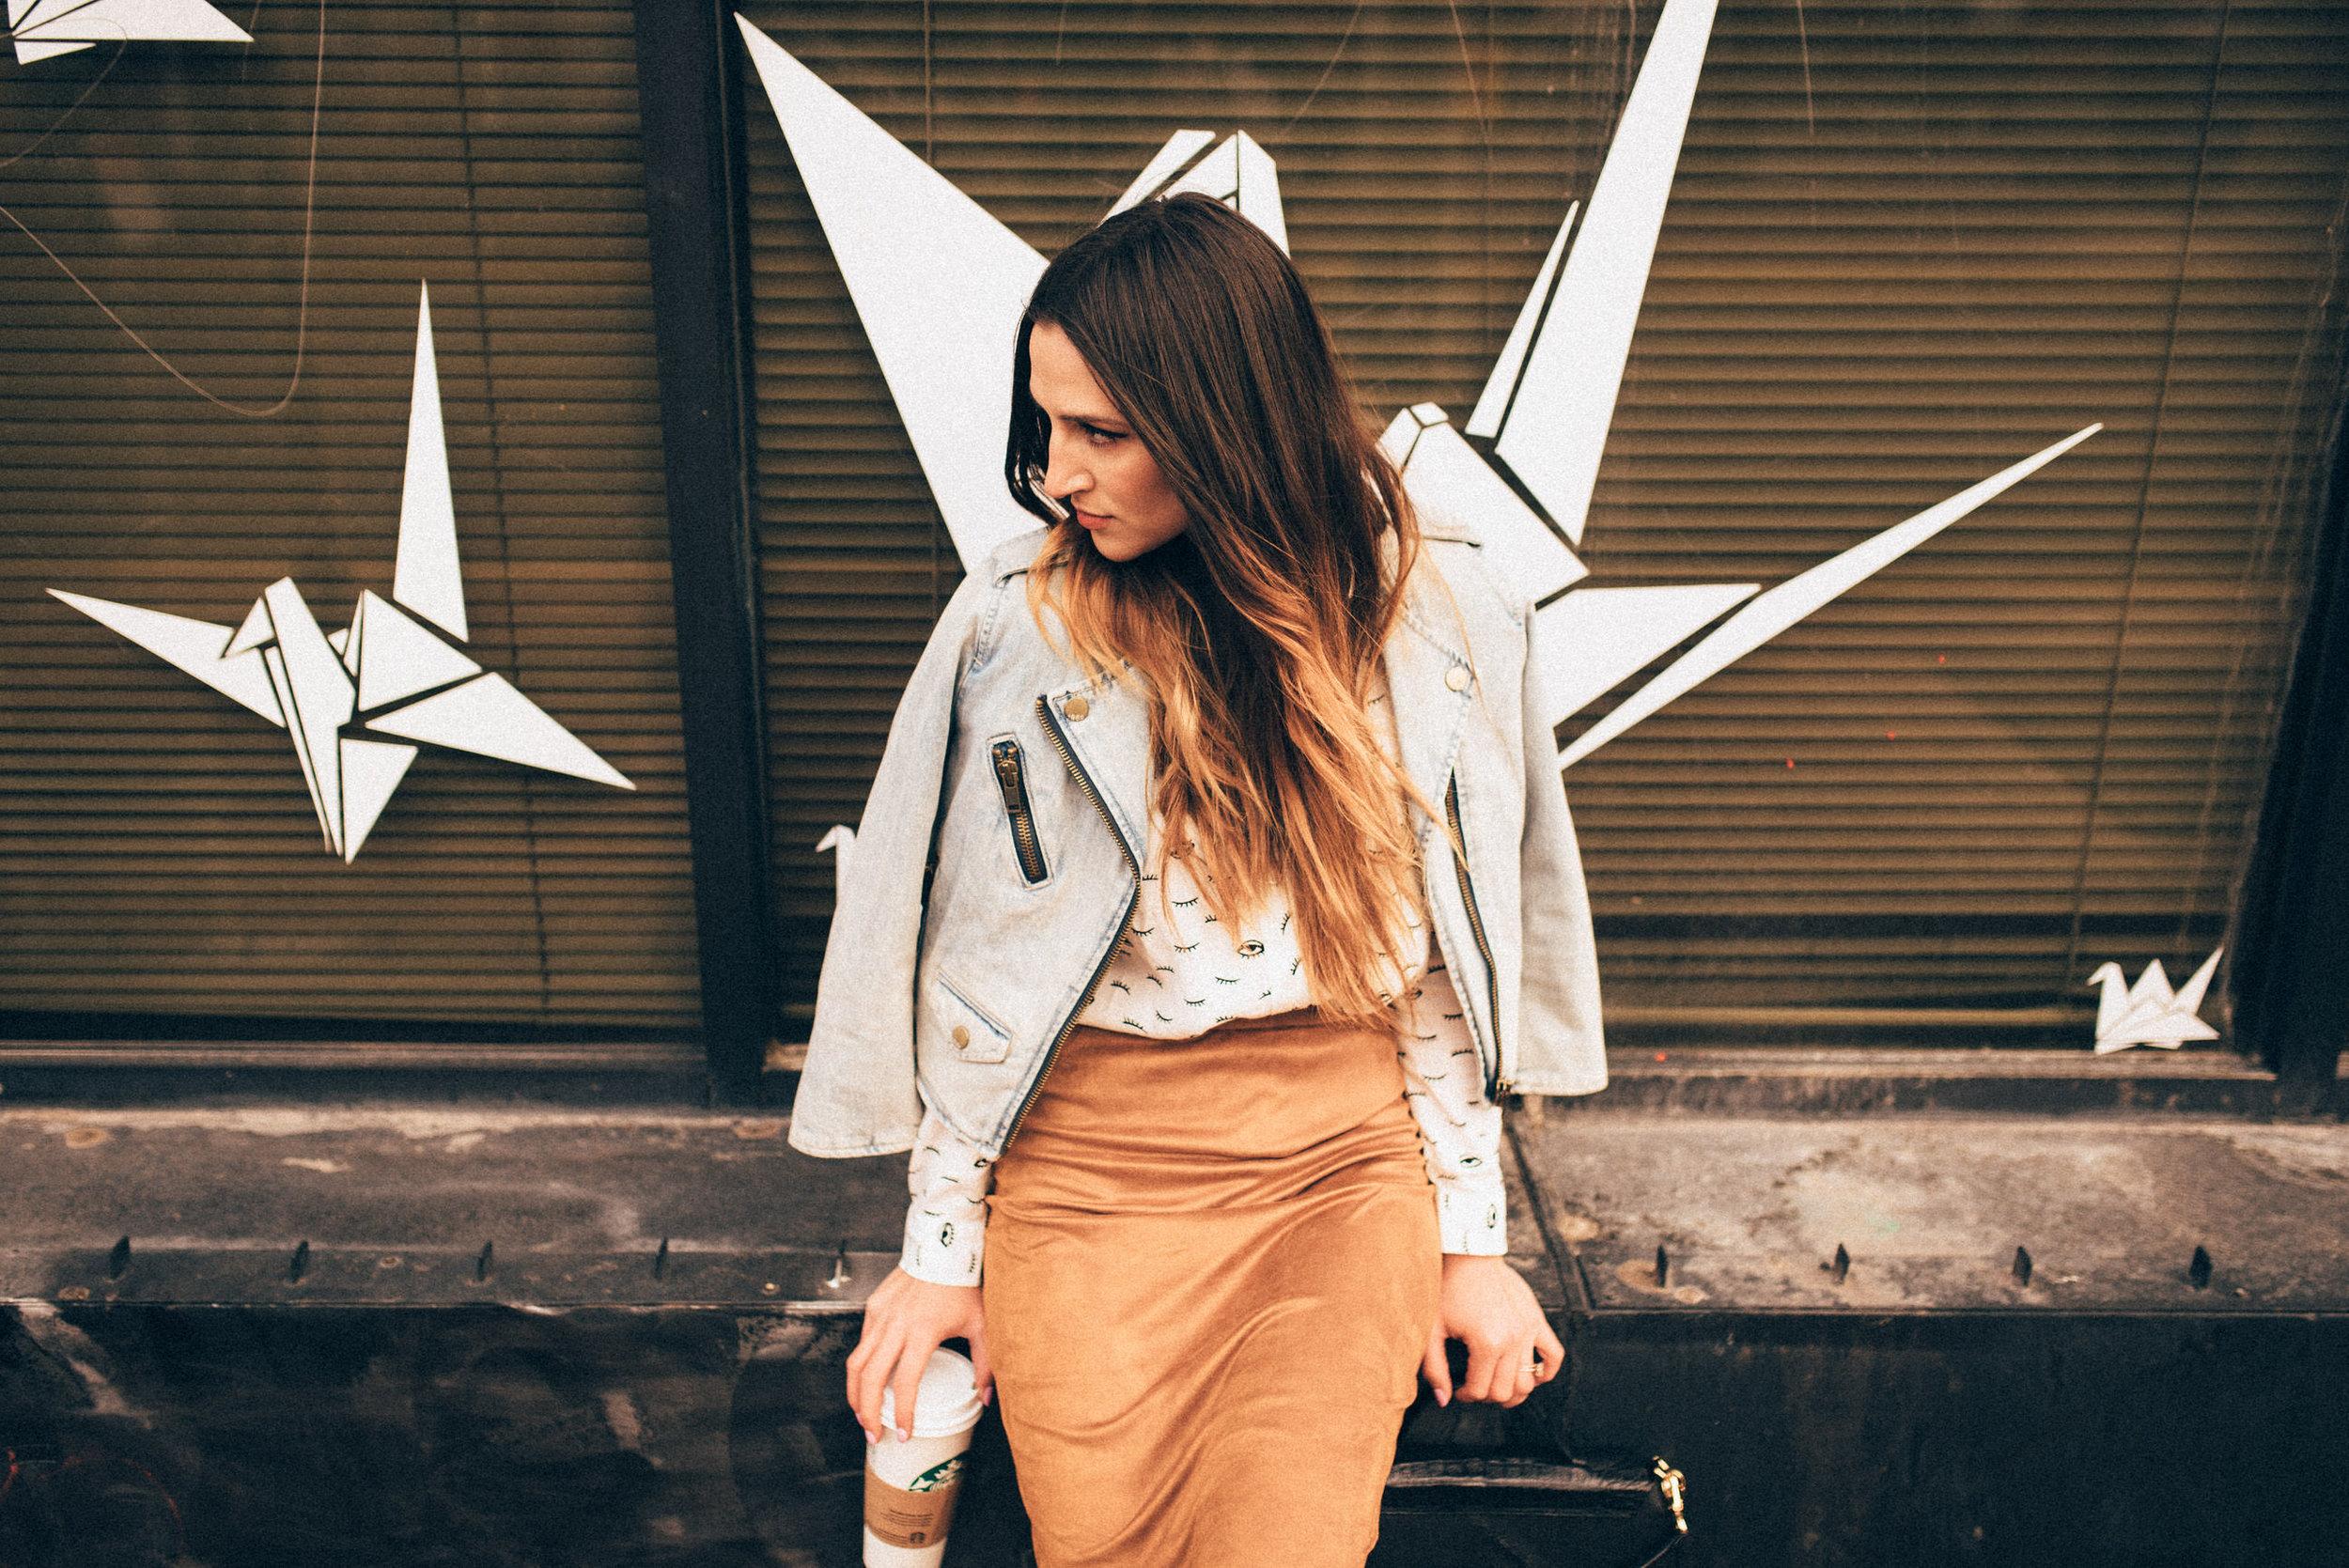 ciera-hudson-fashion-blogger-model-downtown-albuquerque-1-26-2017-gabe-segura-photographer (35 of 68).jpg